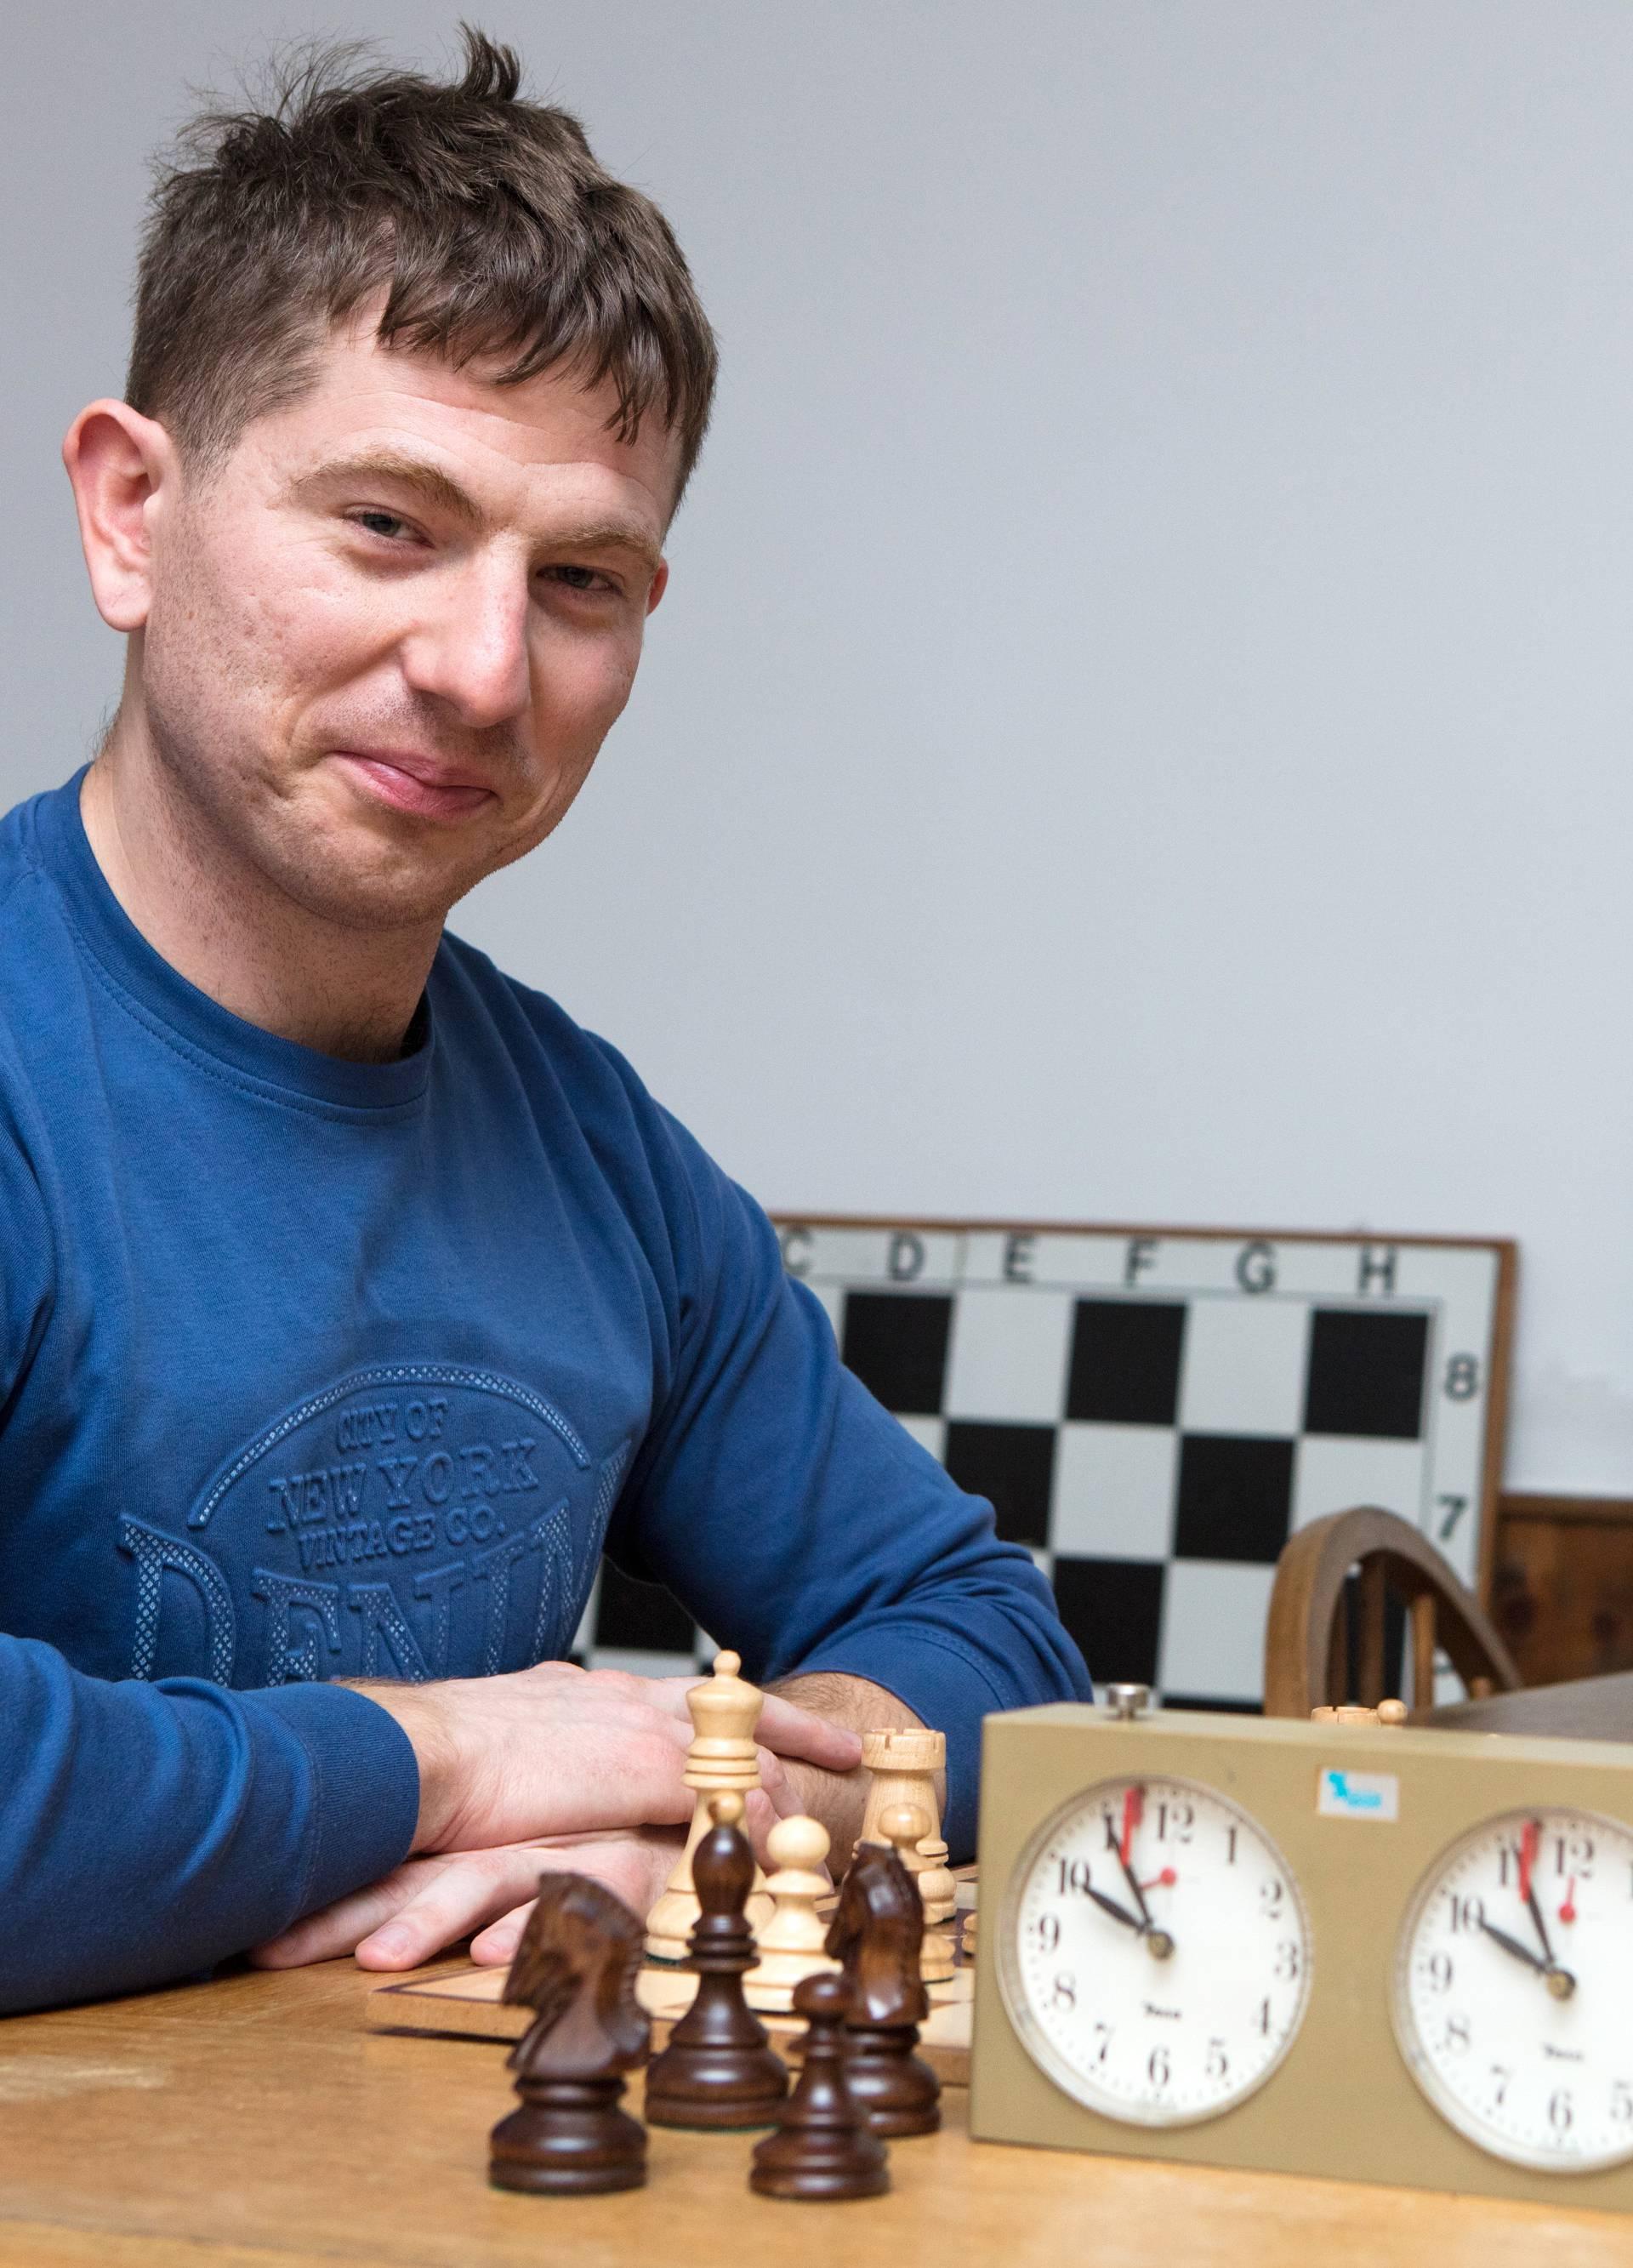 'Igrali smo šah šest sati, po tri kilograma izgubili i - remizirali'